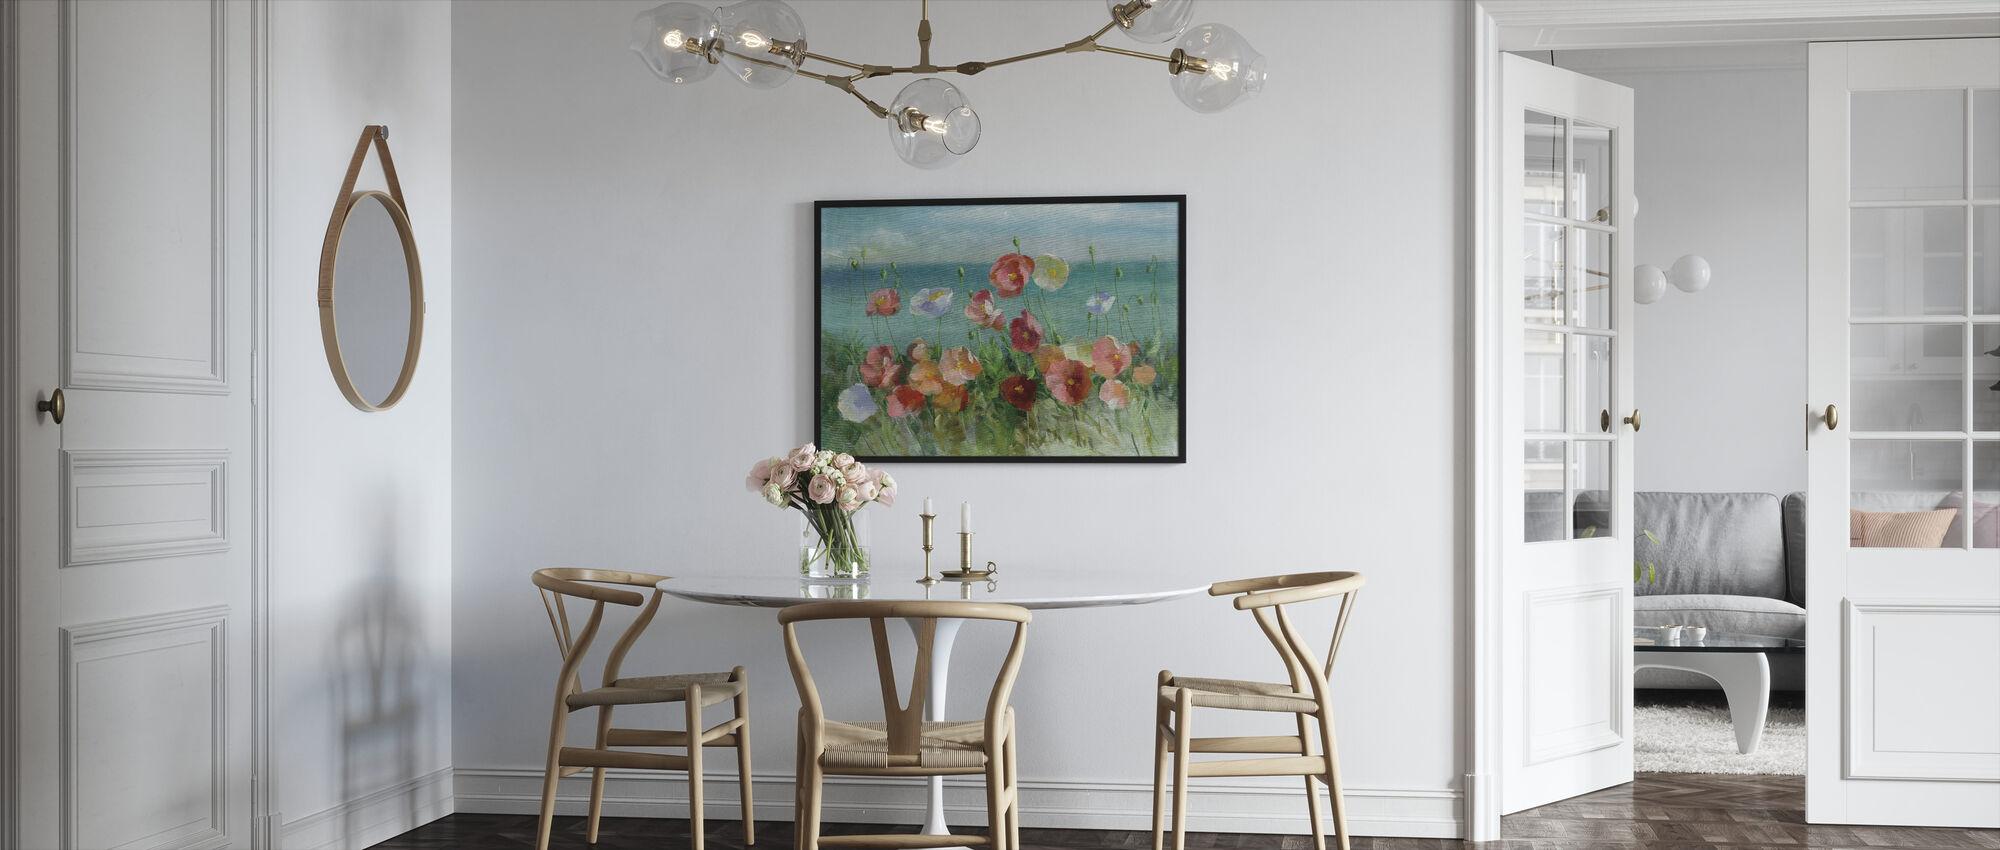 Coastal Poppies - Framed print - Kitchen